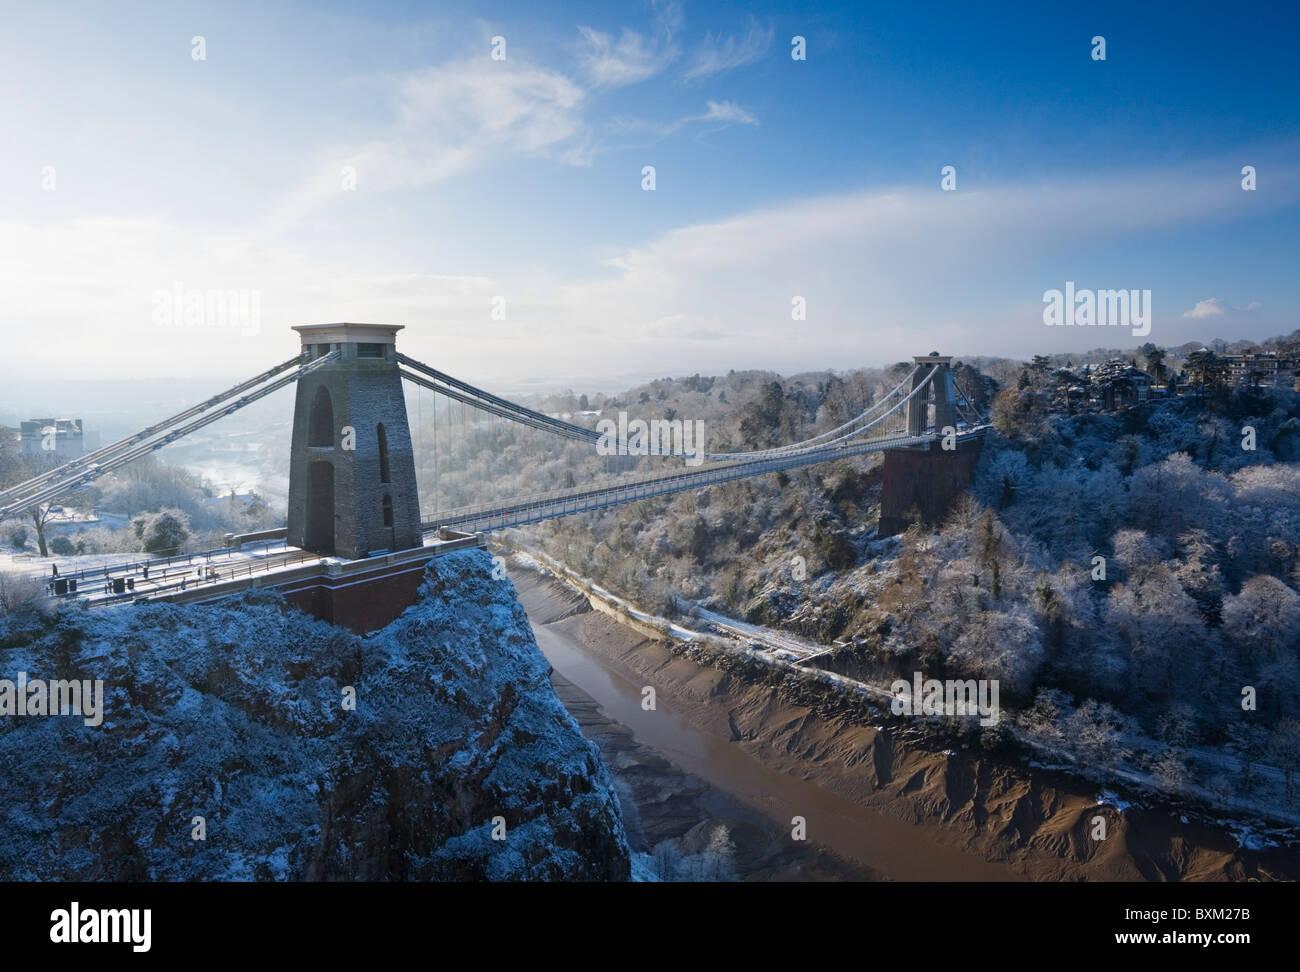 Pont suspendu de Clifton, l'hiver. Bristol. L'Angleterre. UK. Banque D'Images